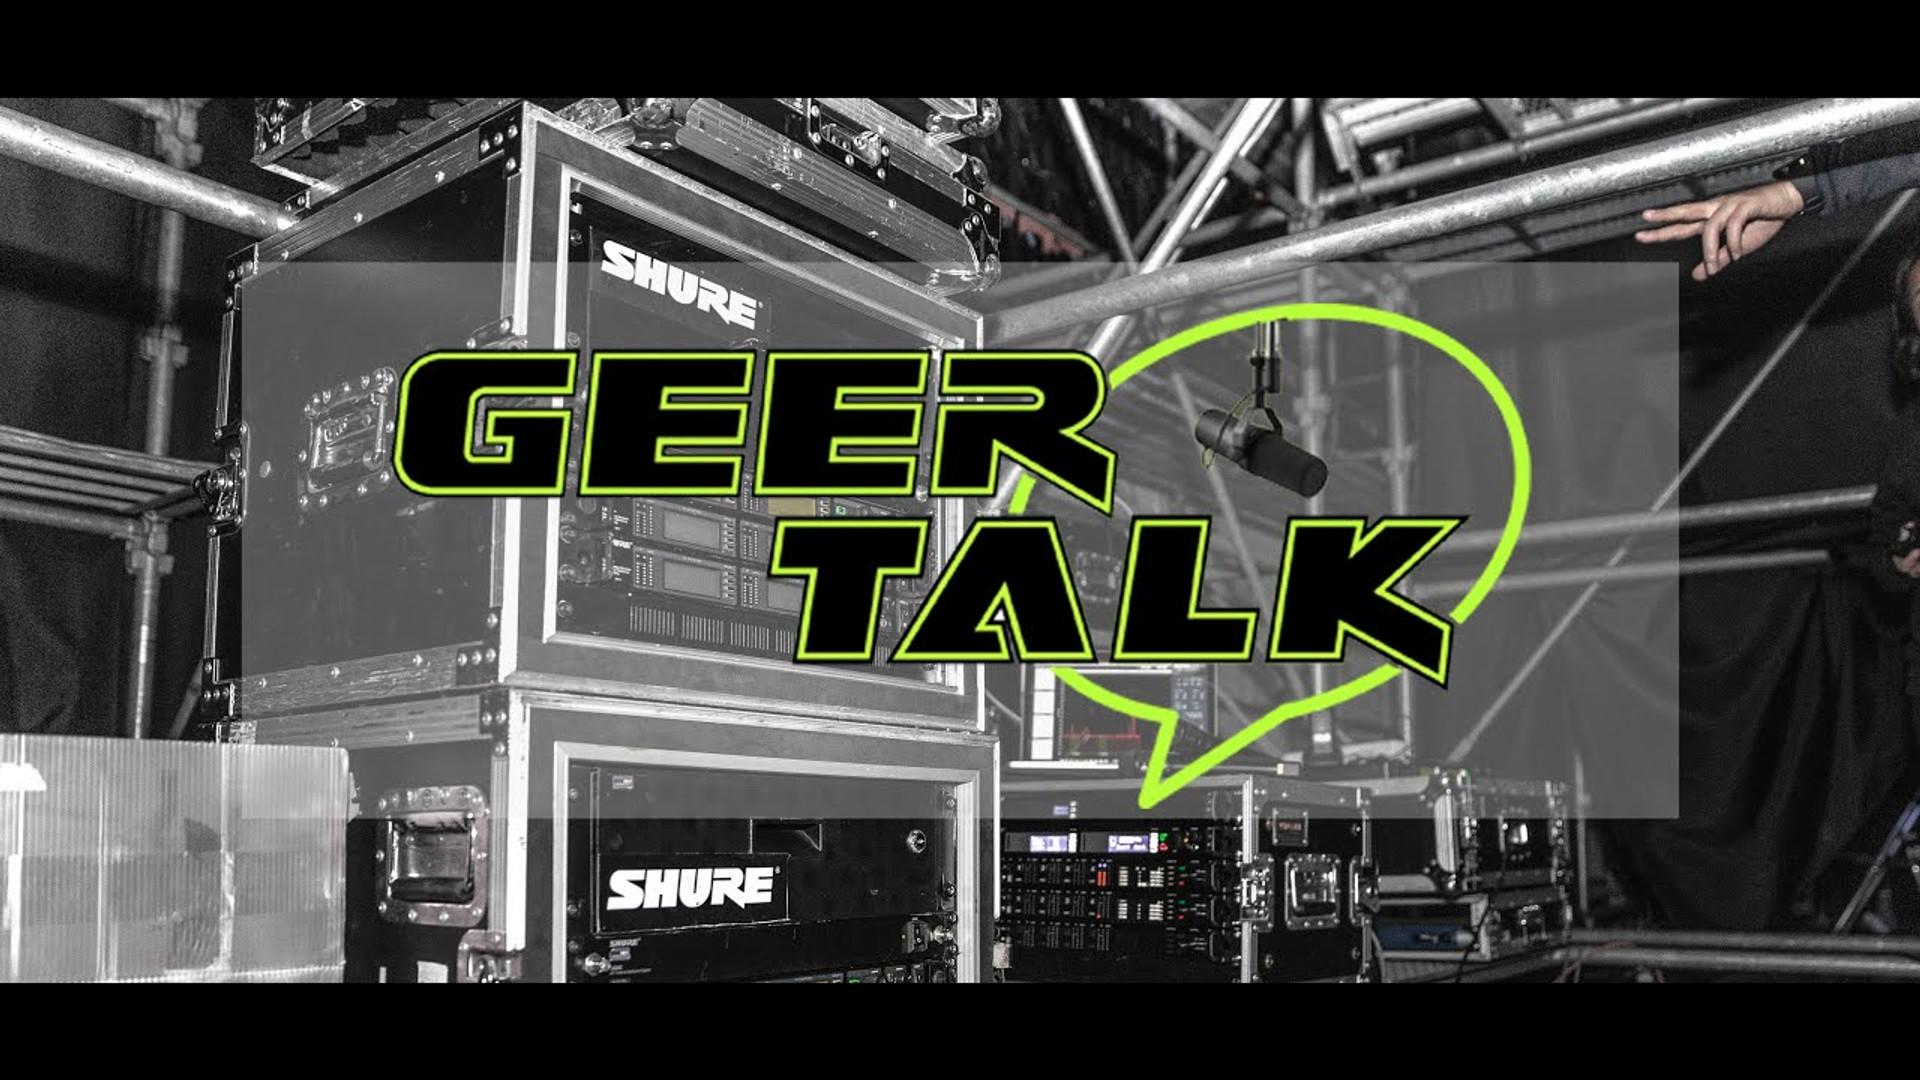 Geer Talk: Shure Pro Live Stream